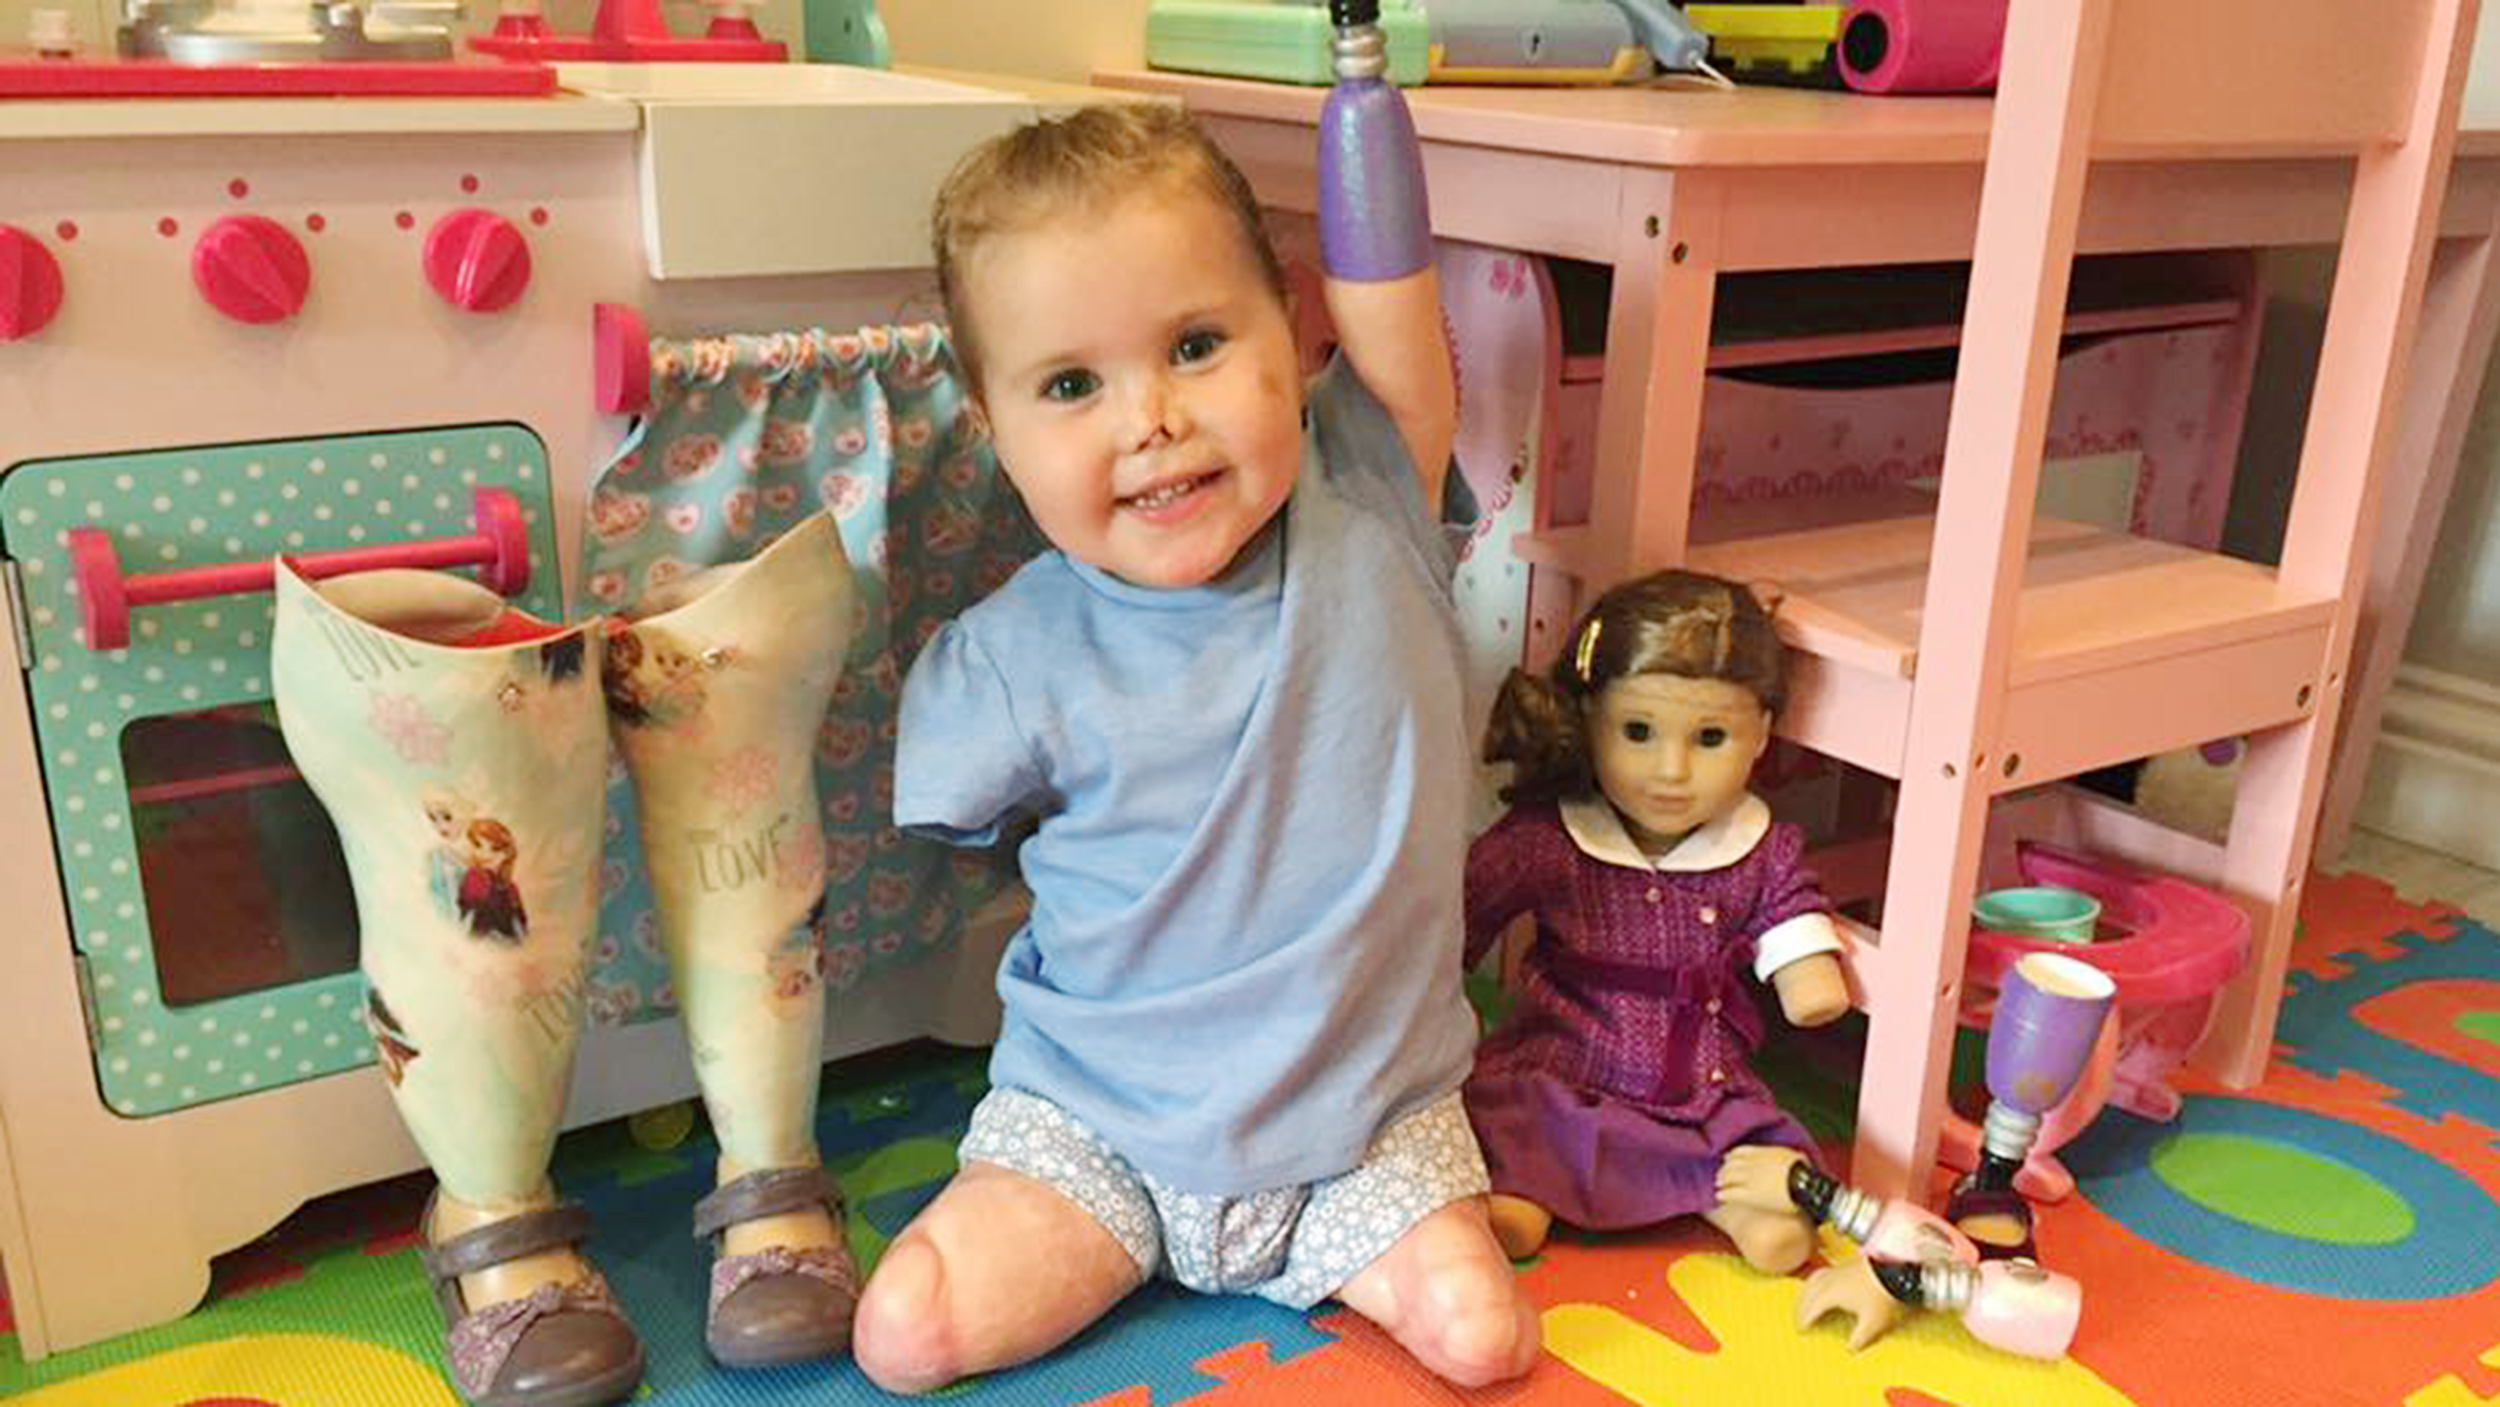 Toddler Bedroom Set Quadruple Amputee 2 Gets Look Alike American Girl Doll